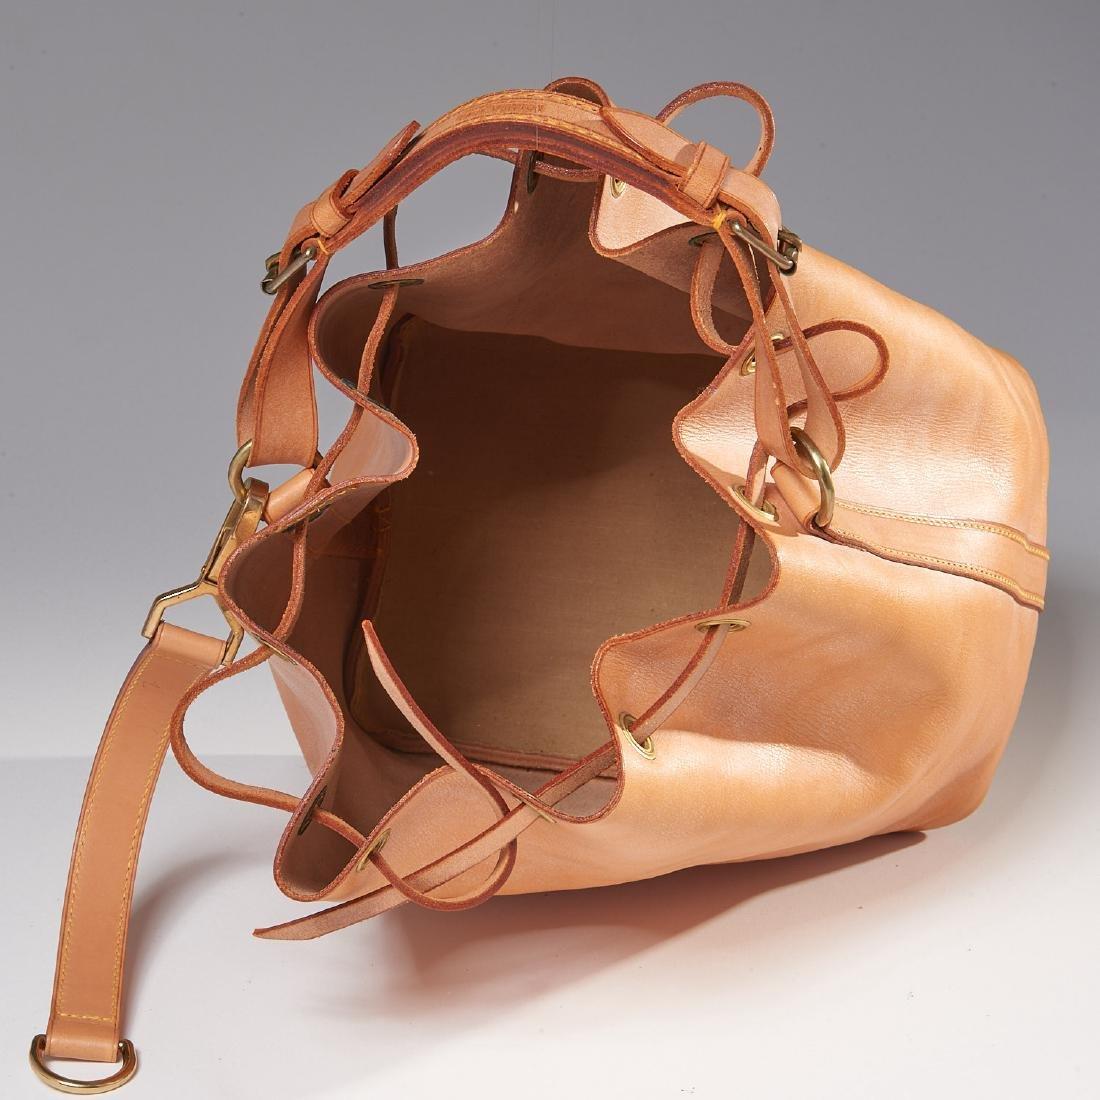 Louis Vuitton all leather drawstring handbag - 7